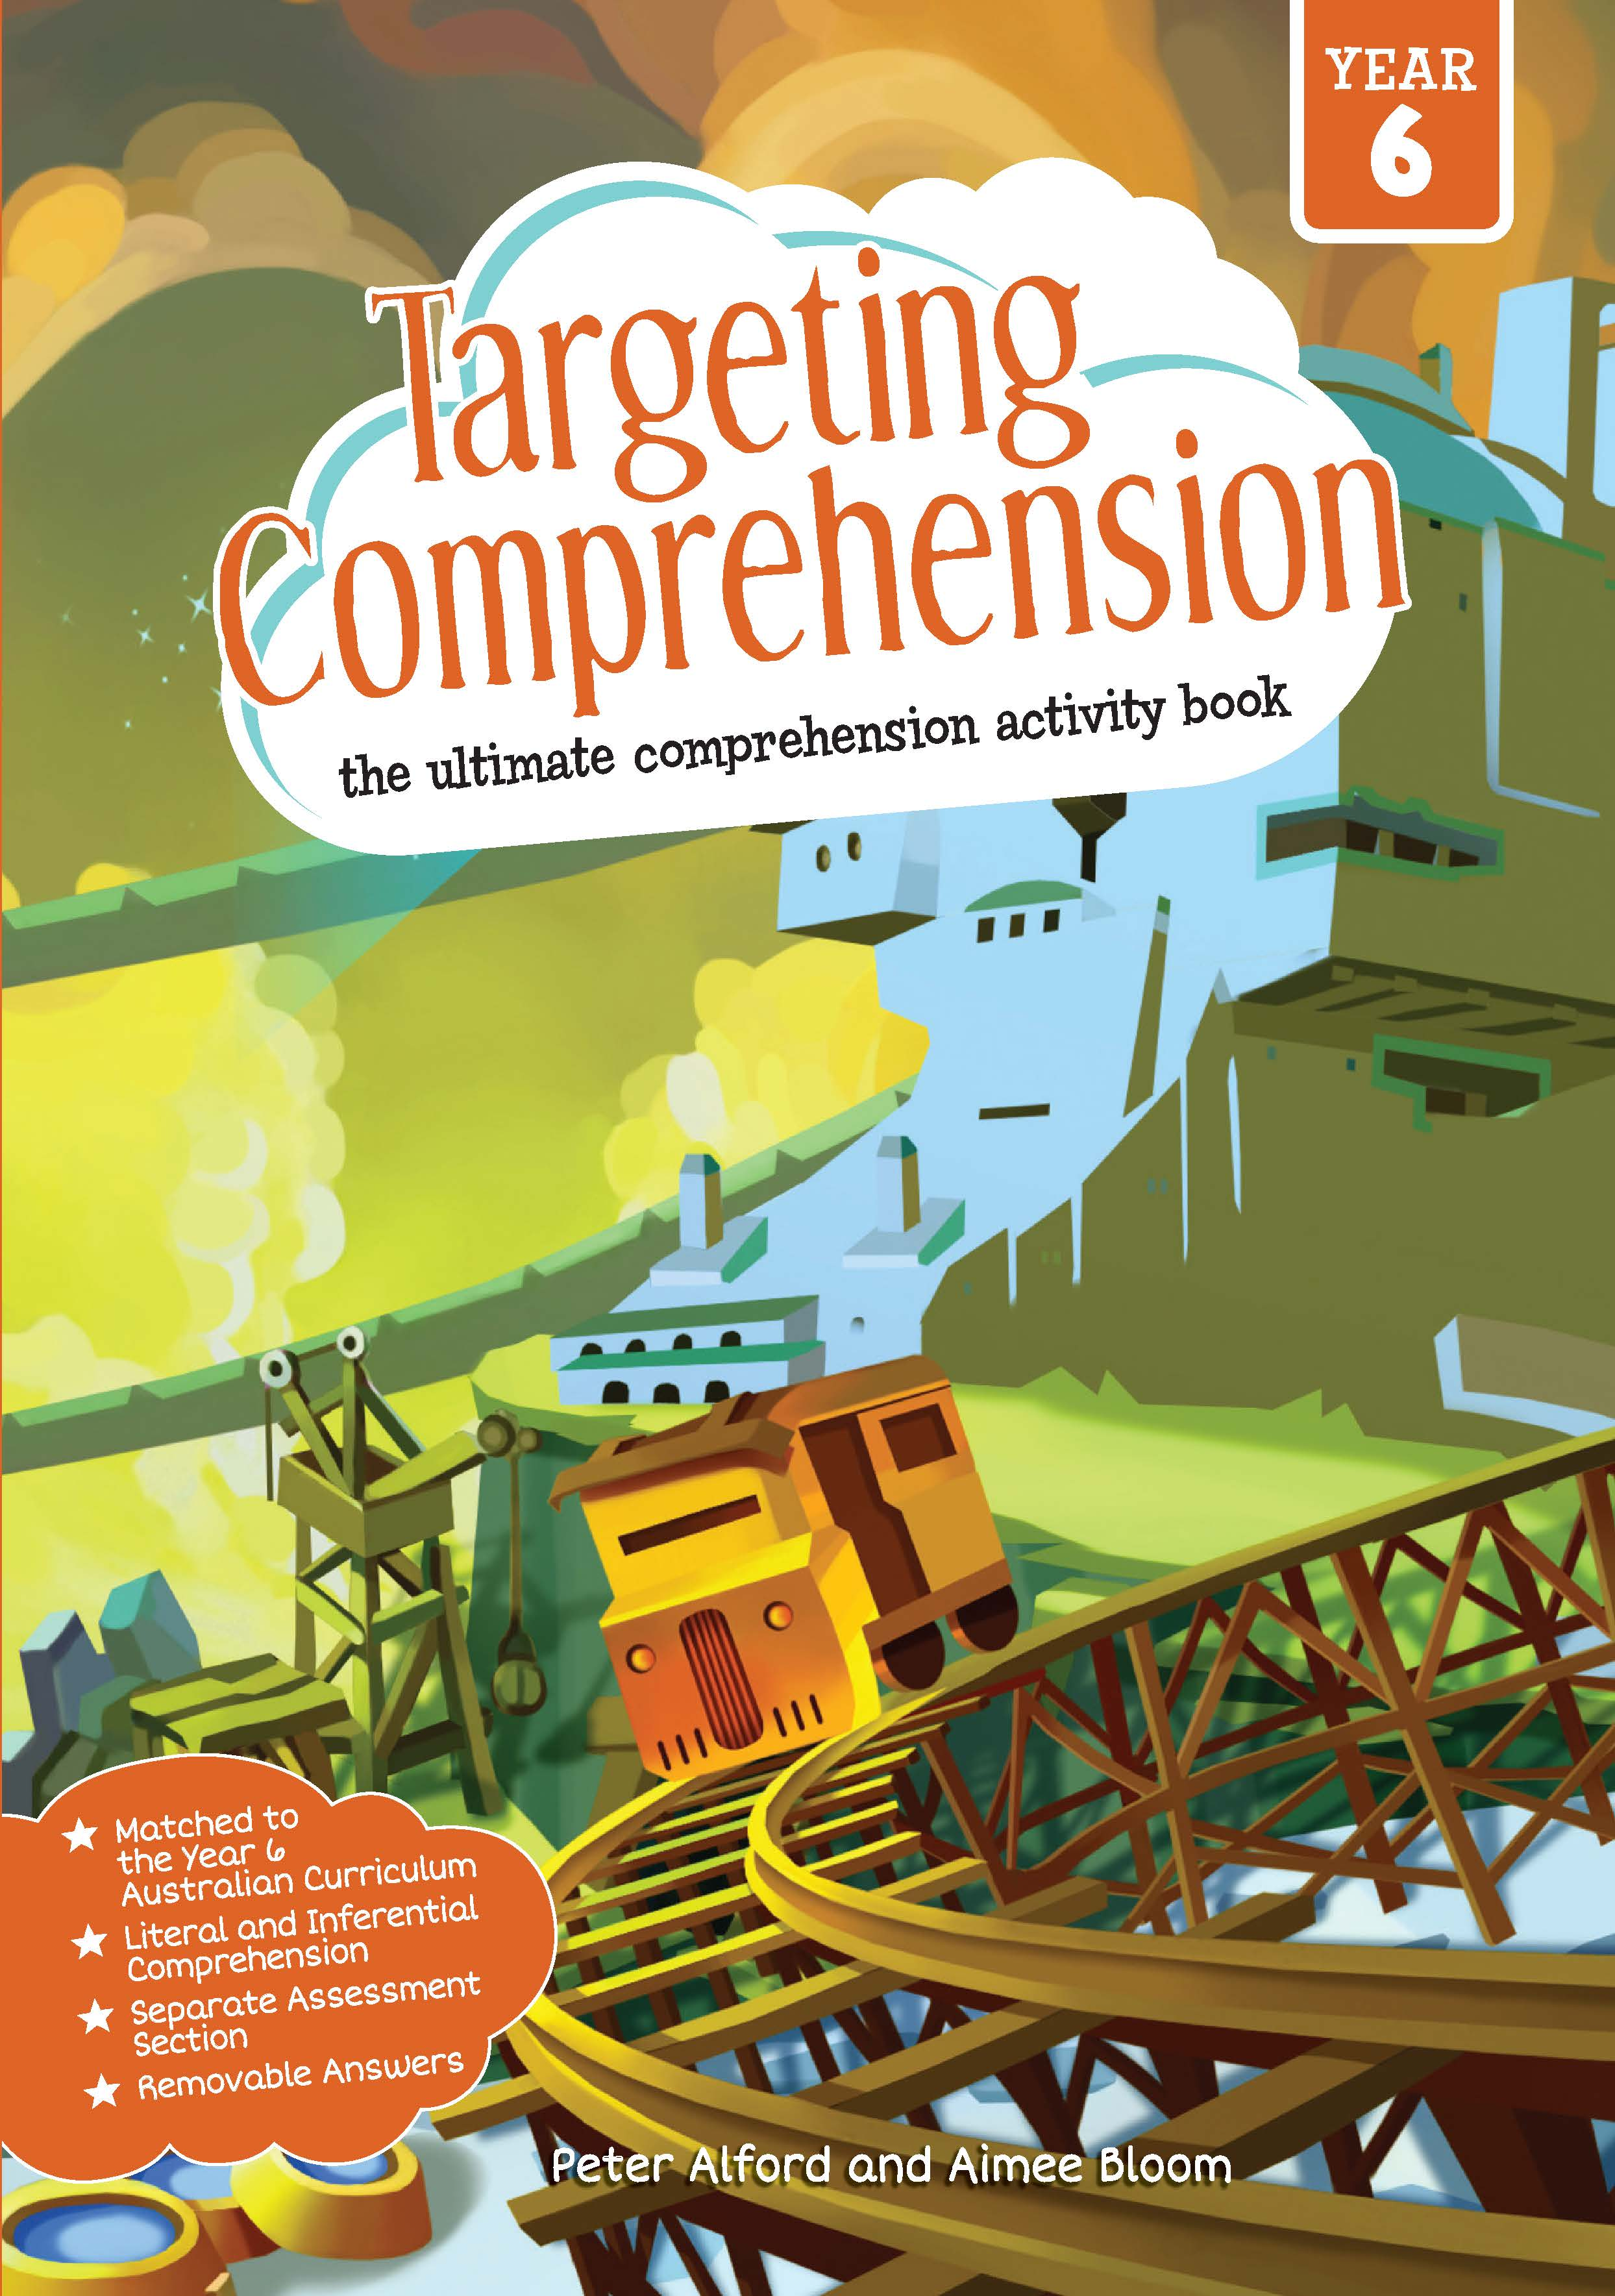 Targeting Comprehension Student Workbook Year 6